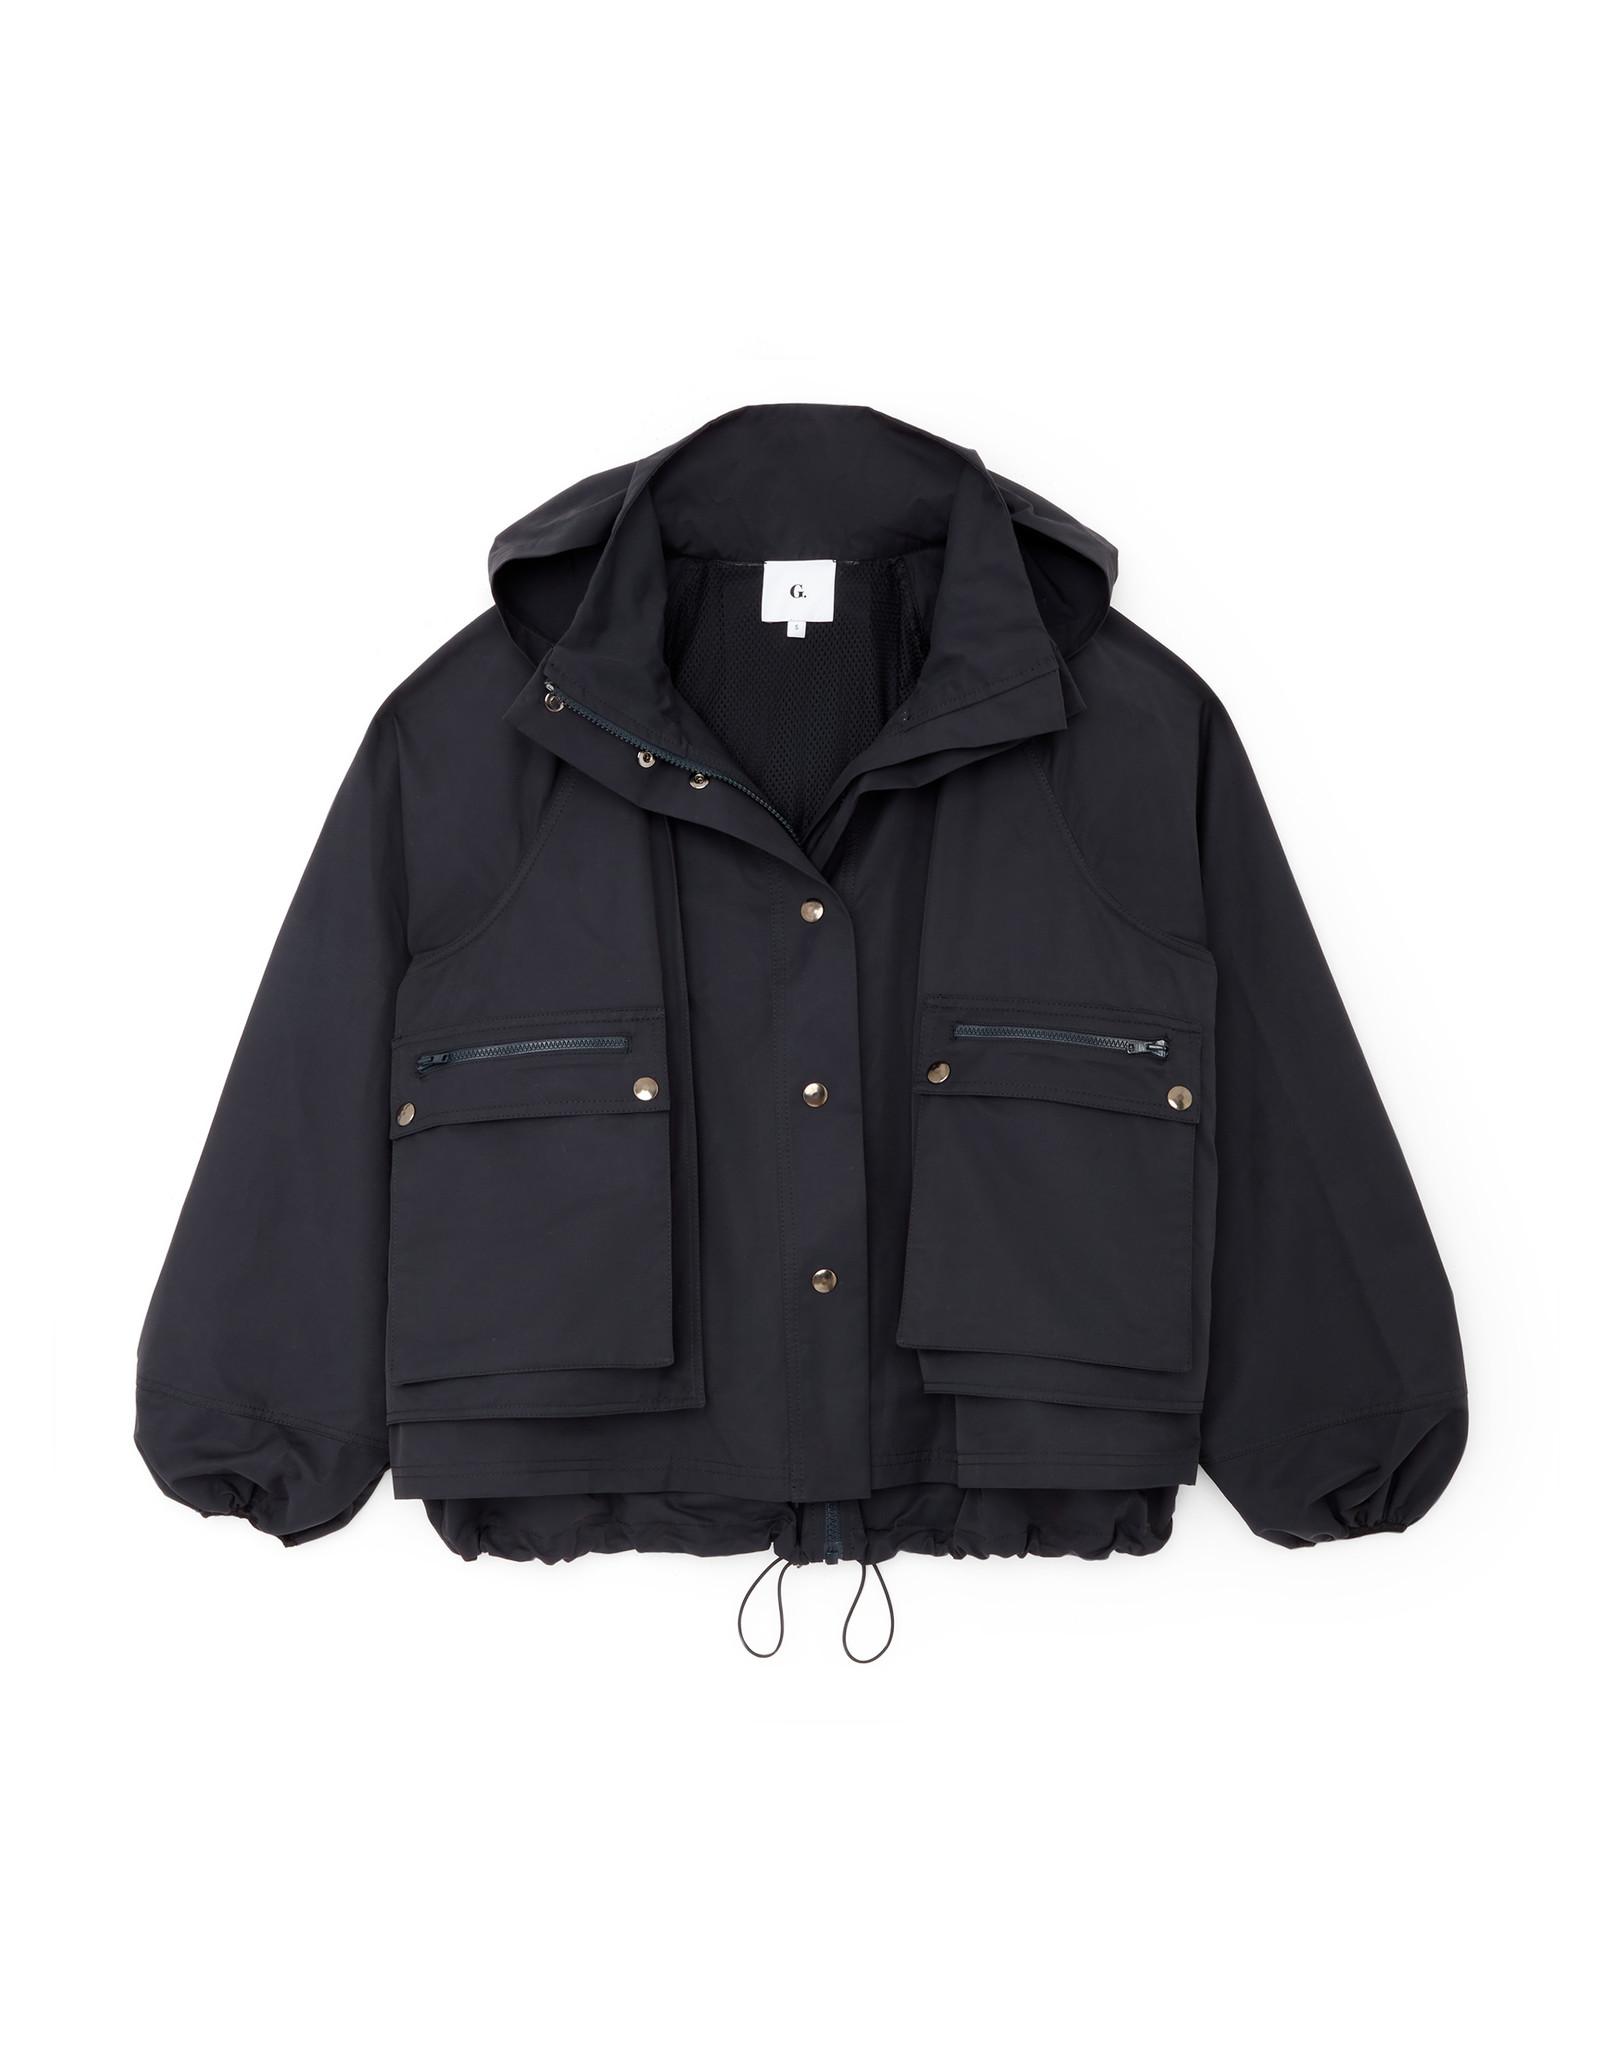 G. Label G. Label Carolyn Utility Performance Jacket (Color: Navy, Size: XL)